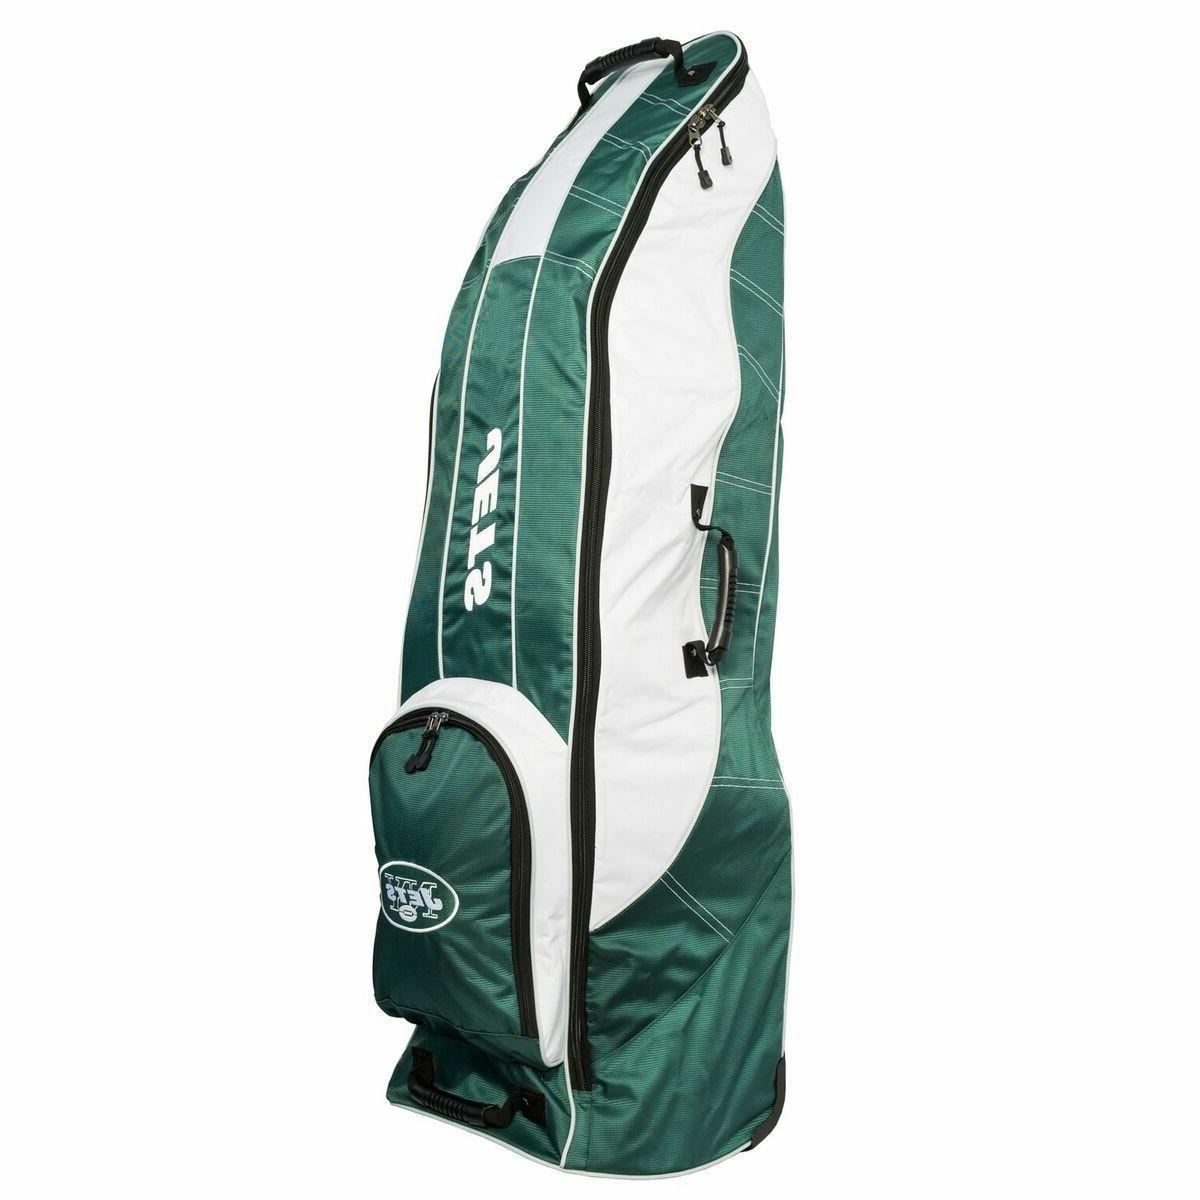 new new york jets golf bag travel